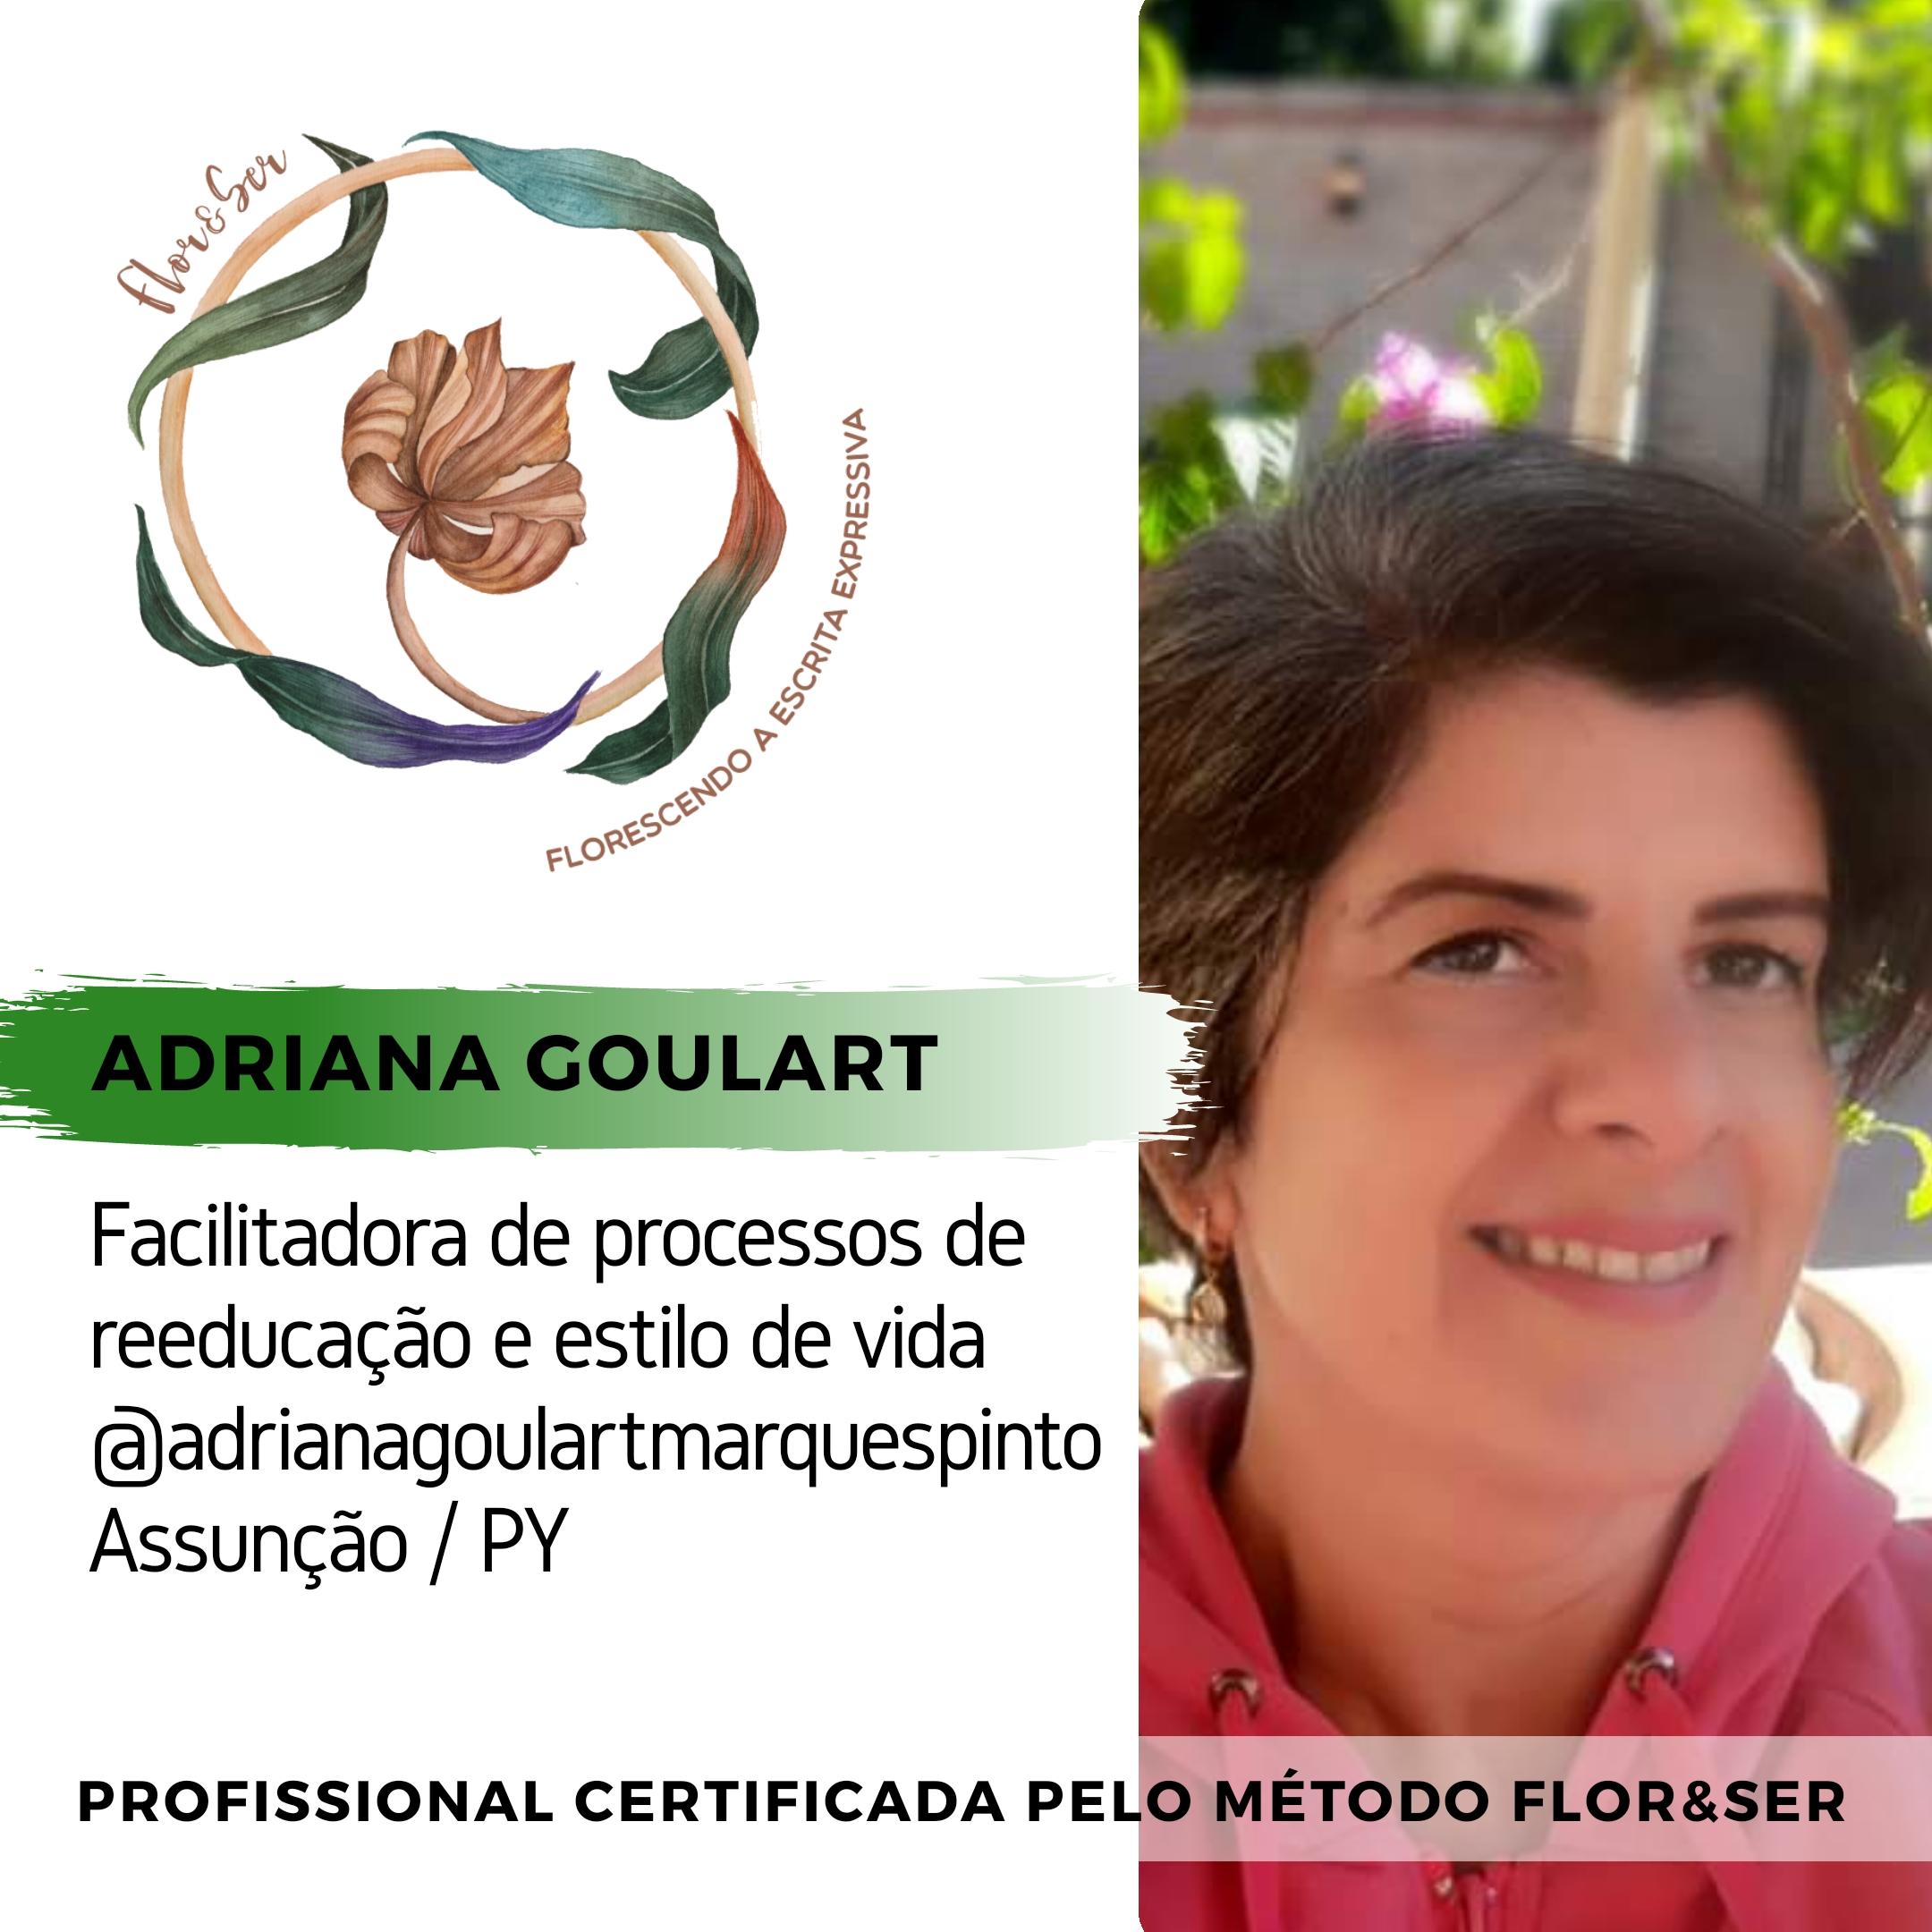 Adriana Goulart